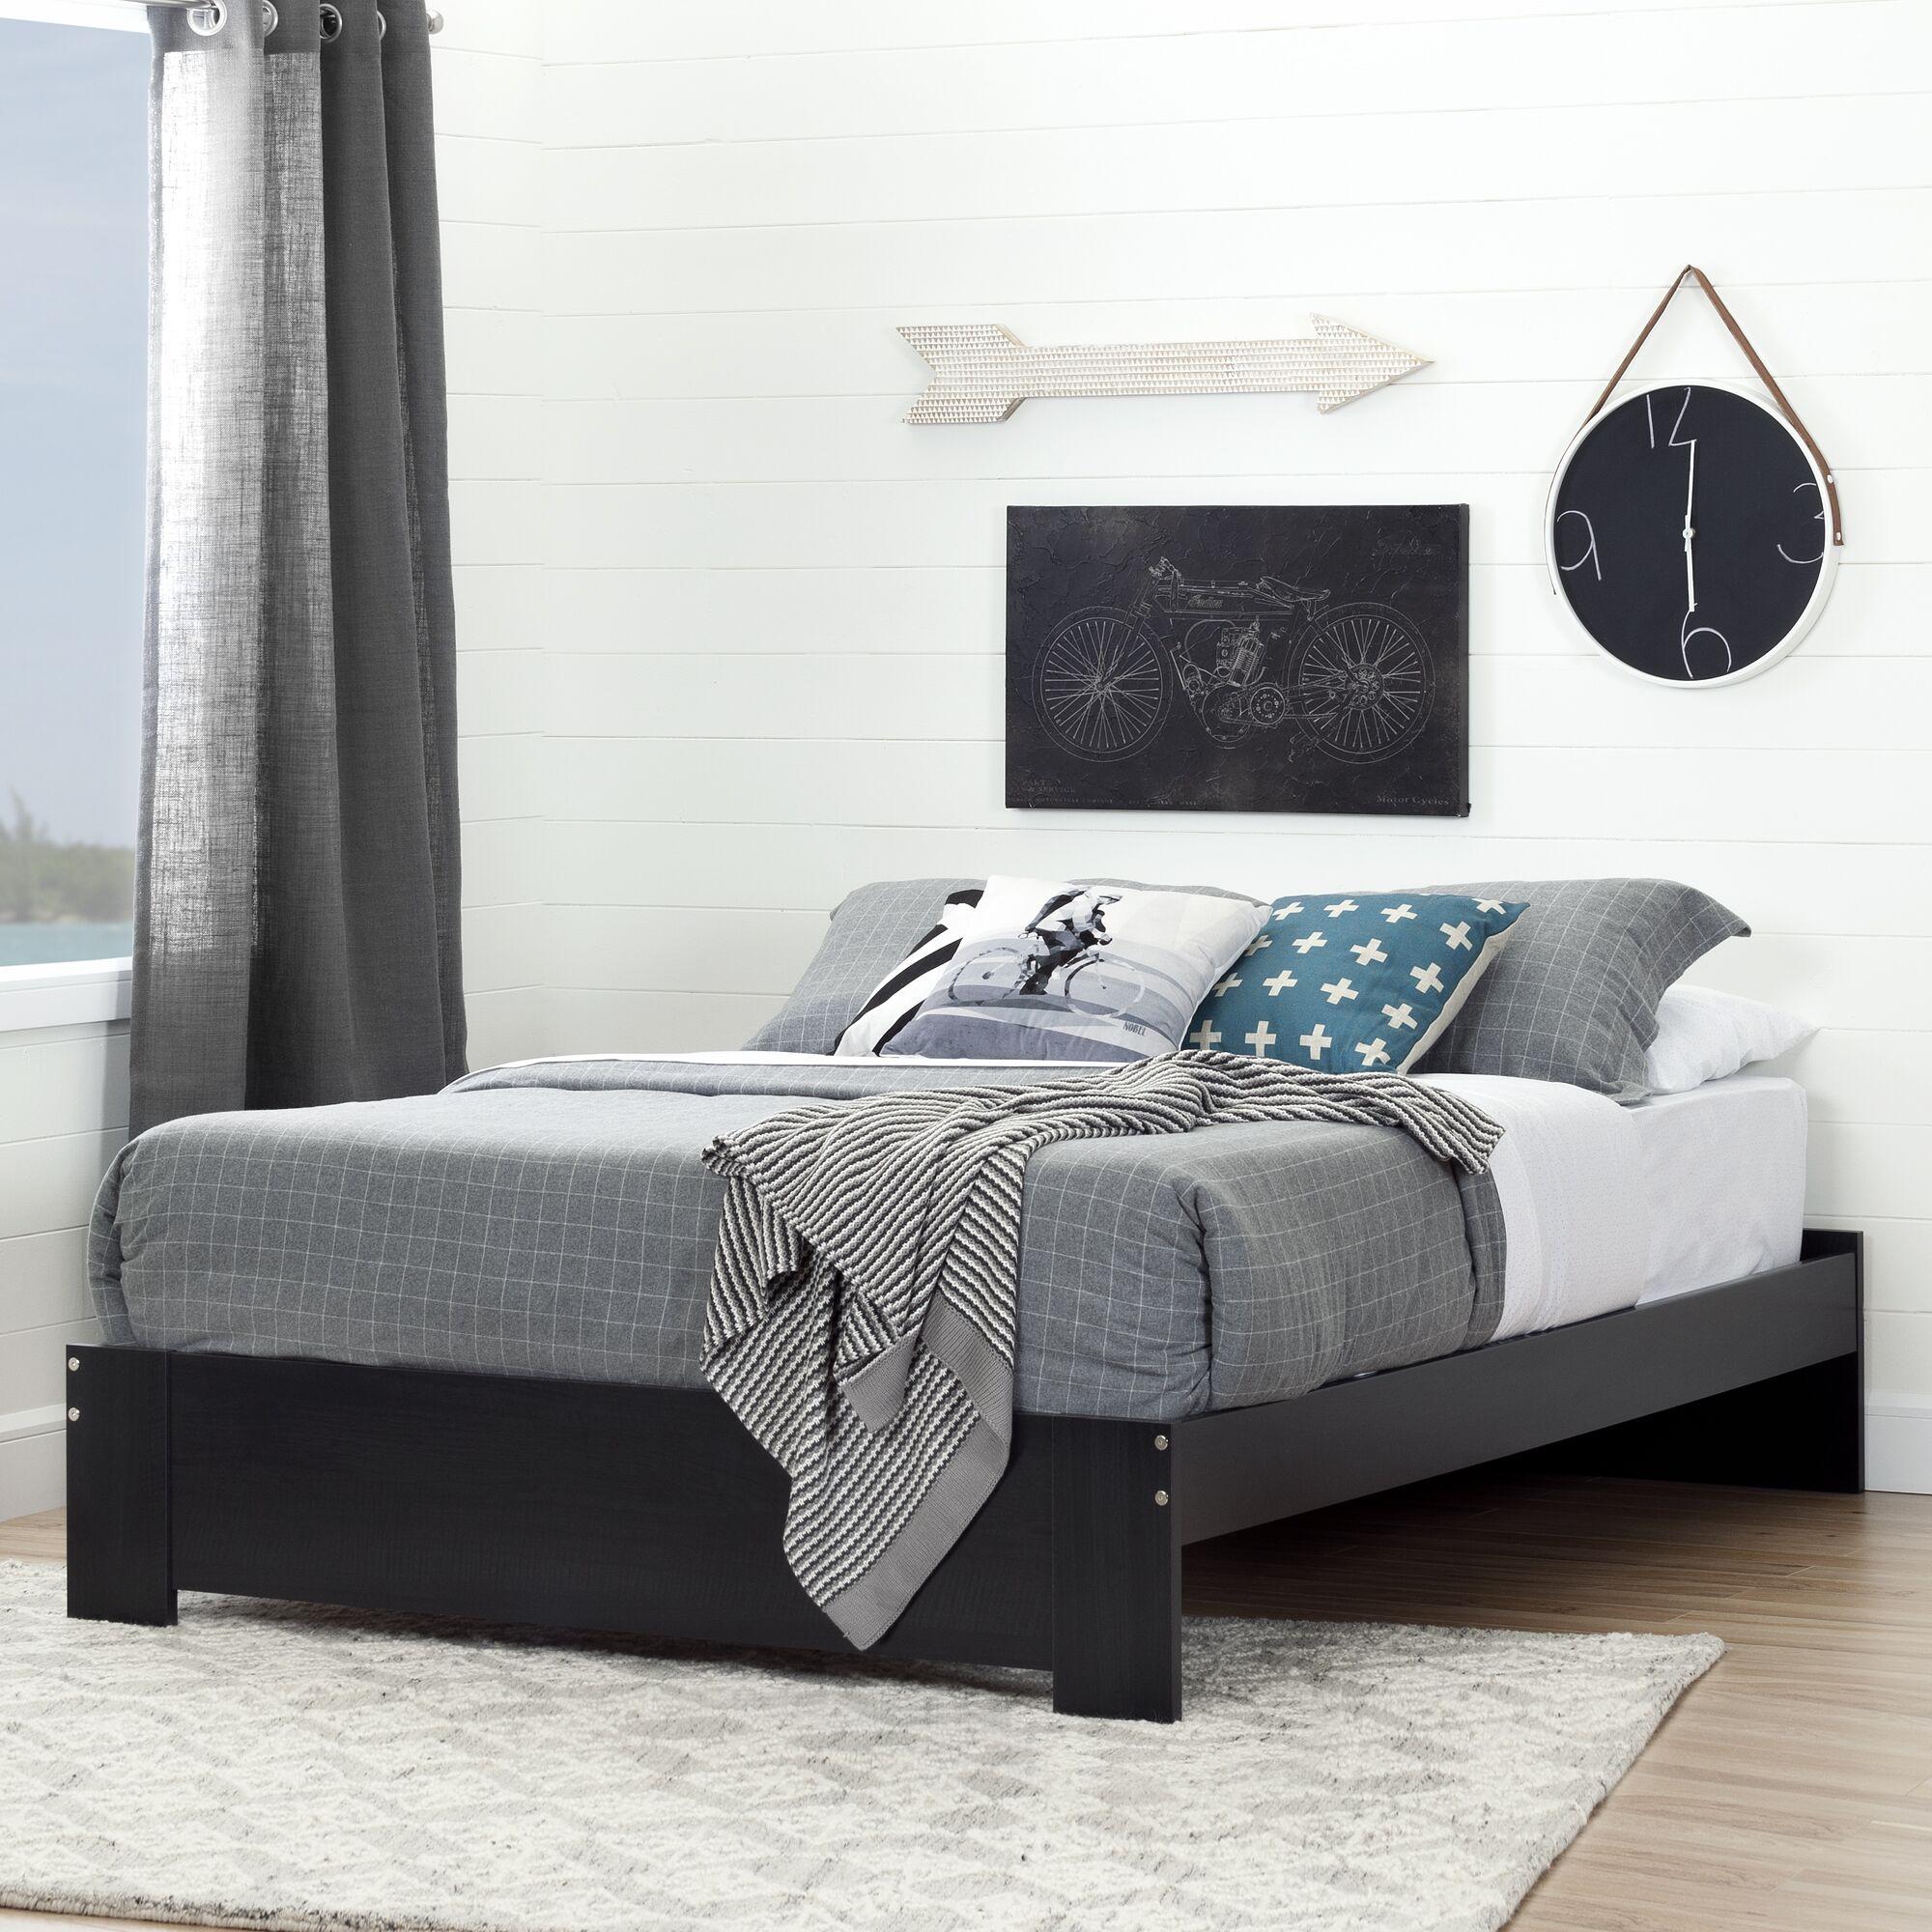 Reevo Queen Platform Bed Color: Black Onyx